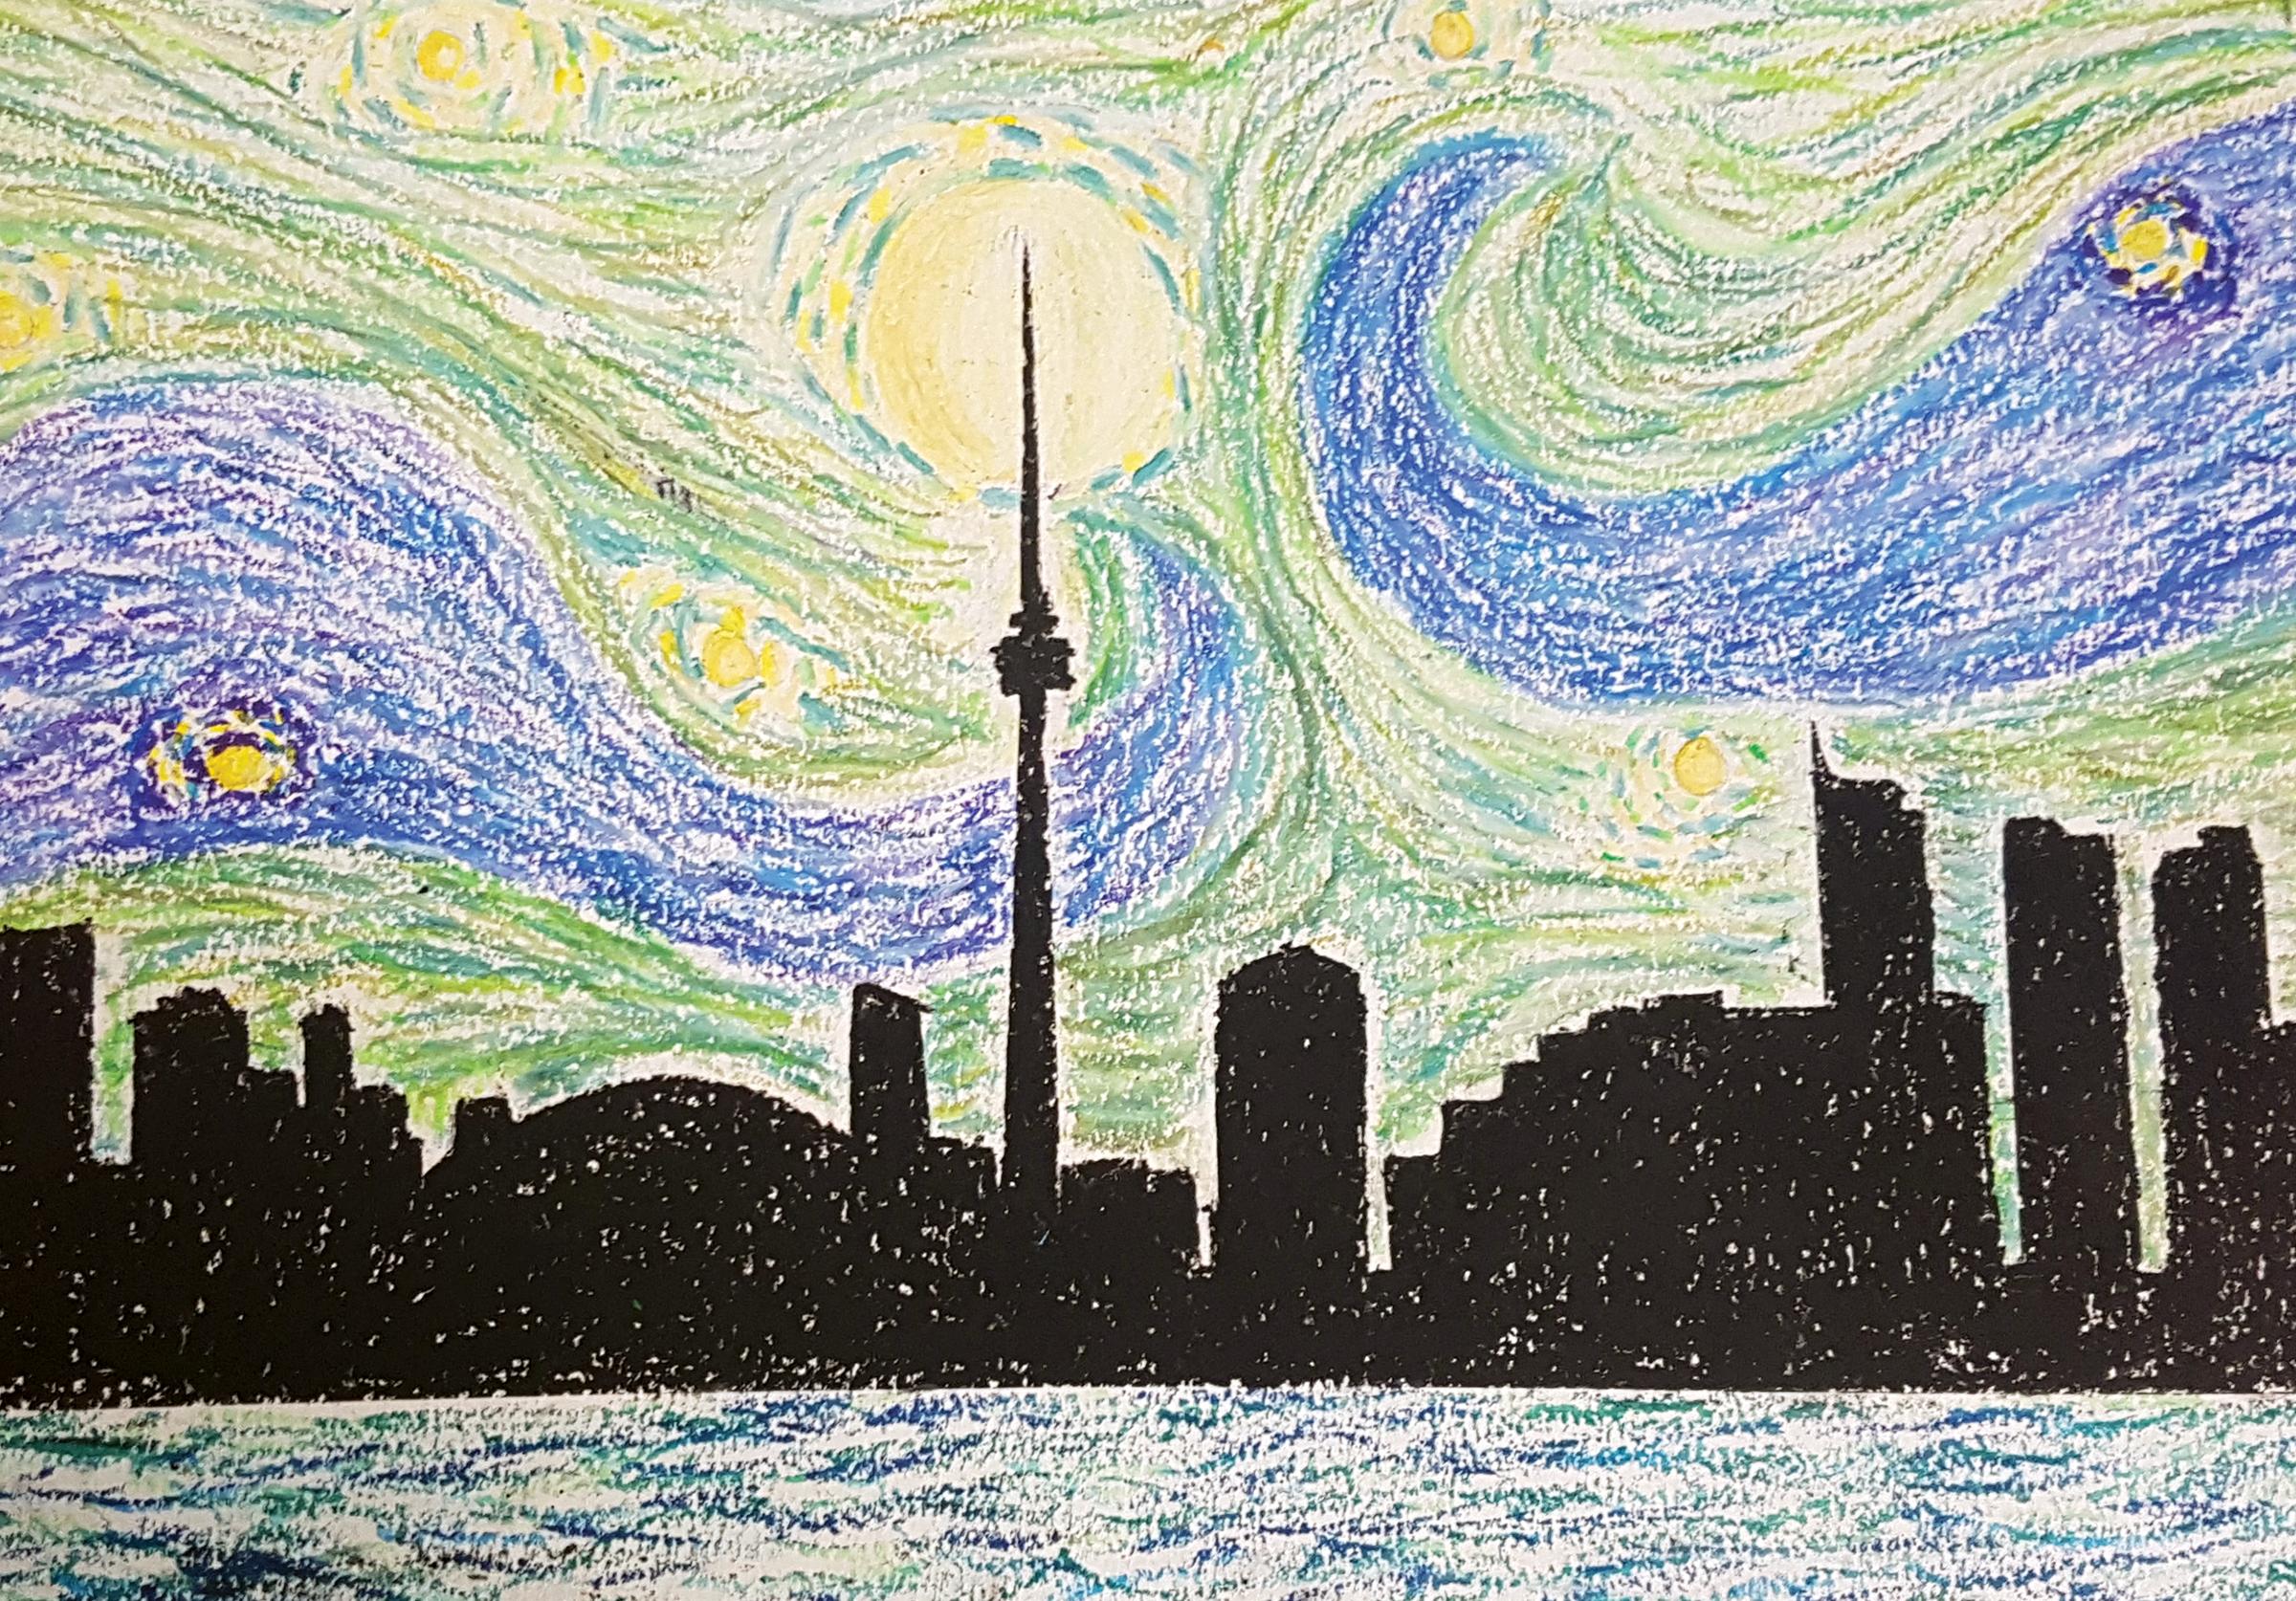 Grade_78_Toronto_starrynight.jpg